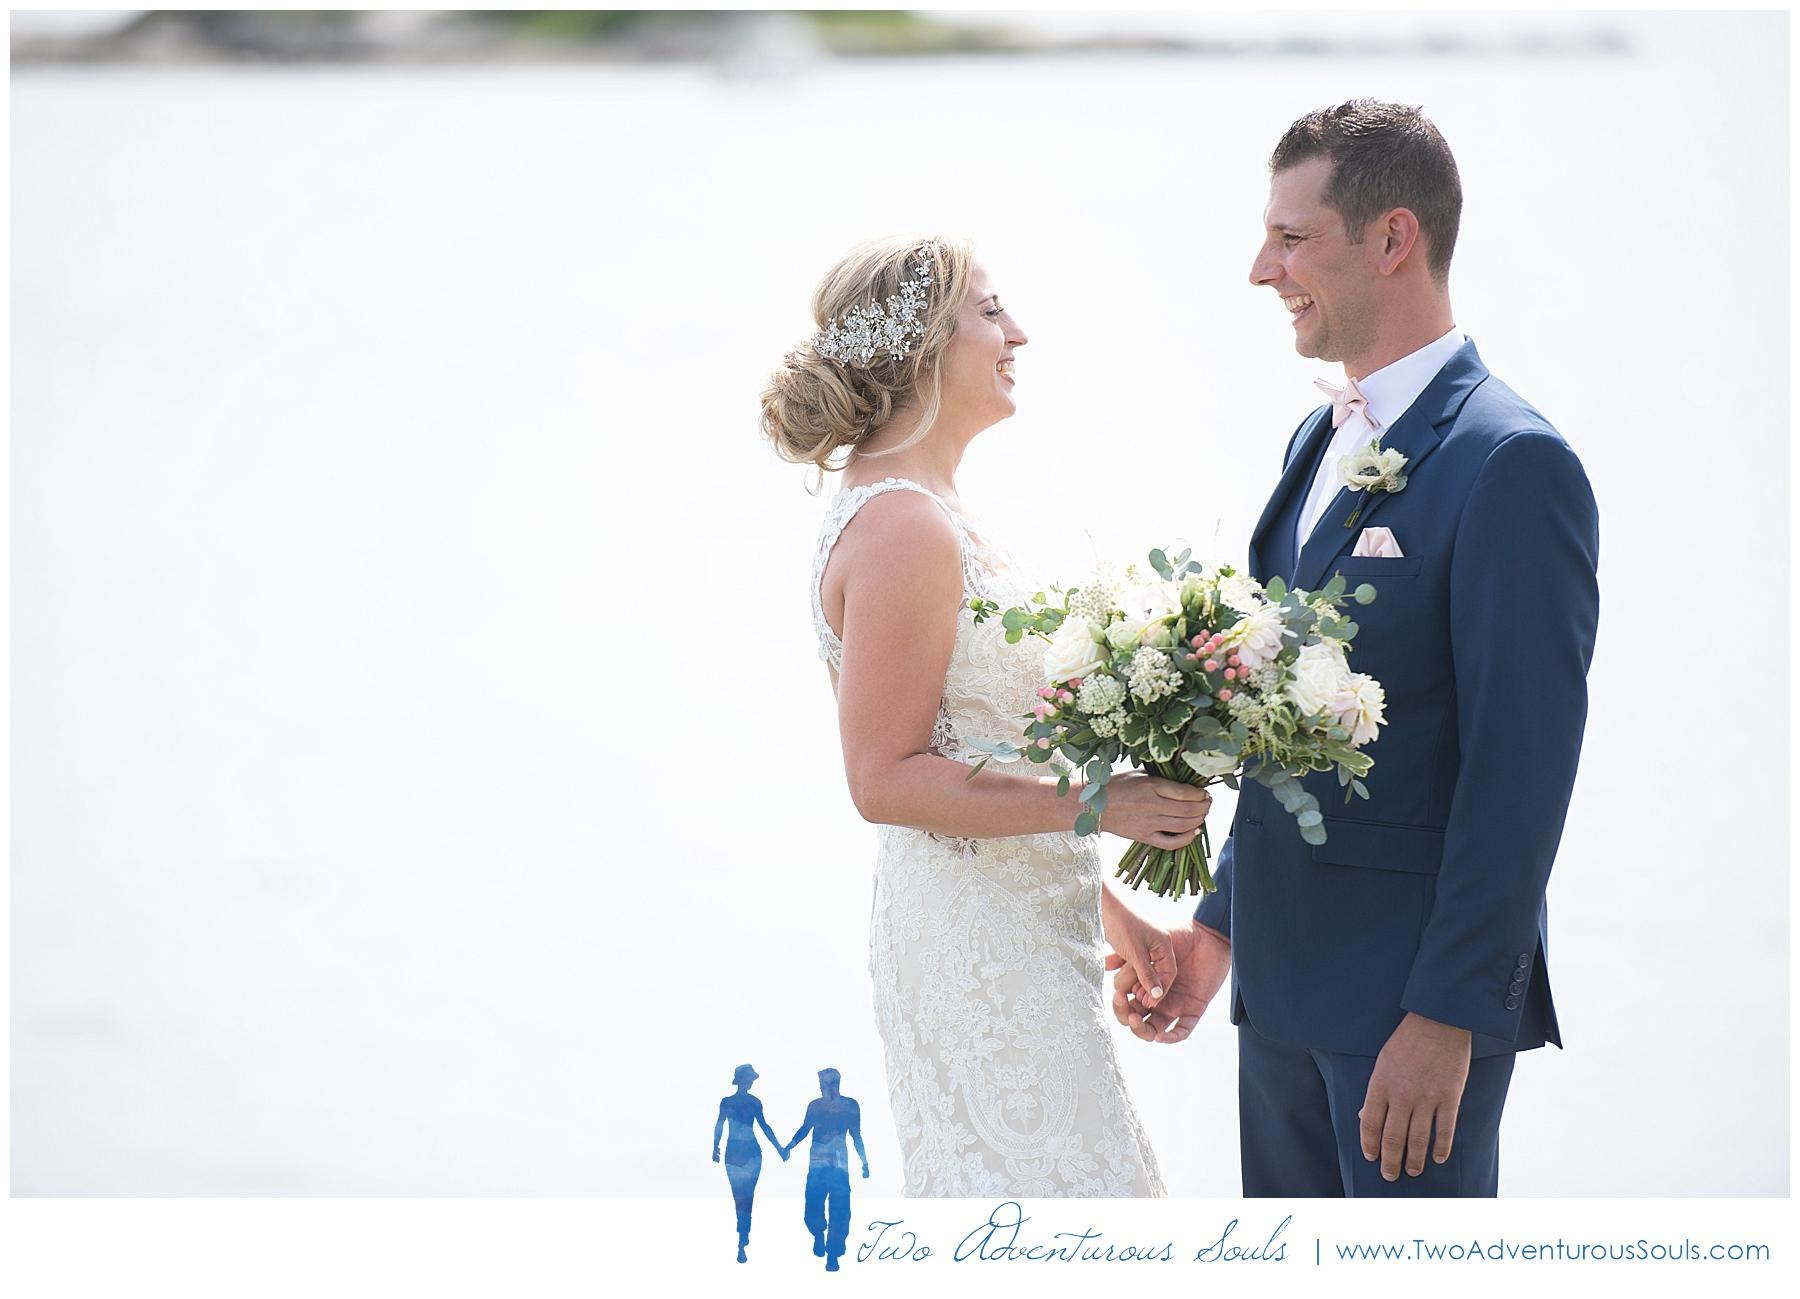 Connecticut Wedding Photographers, Lace Factory Wedding Photographers, Two Adventurous Souls - 083119_0023.jpg